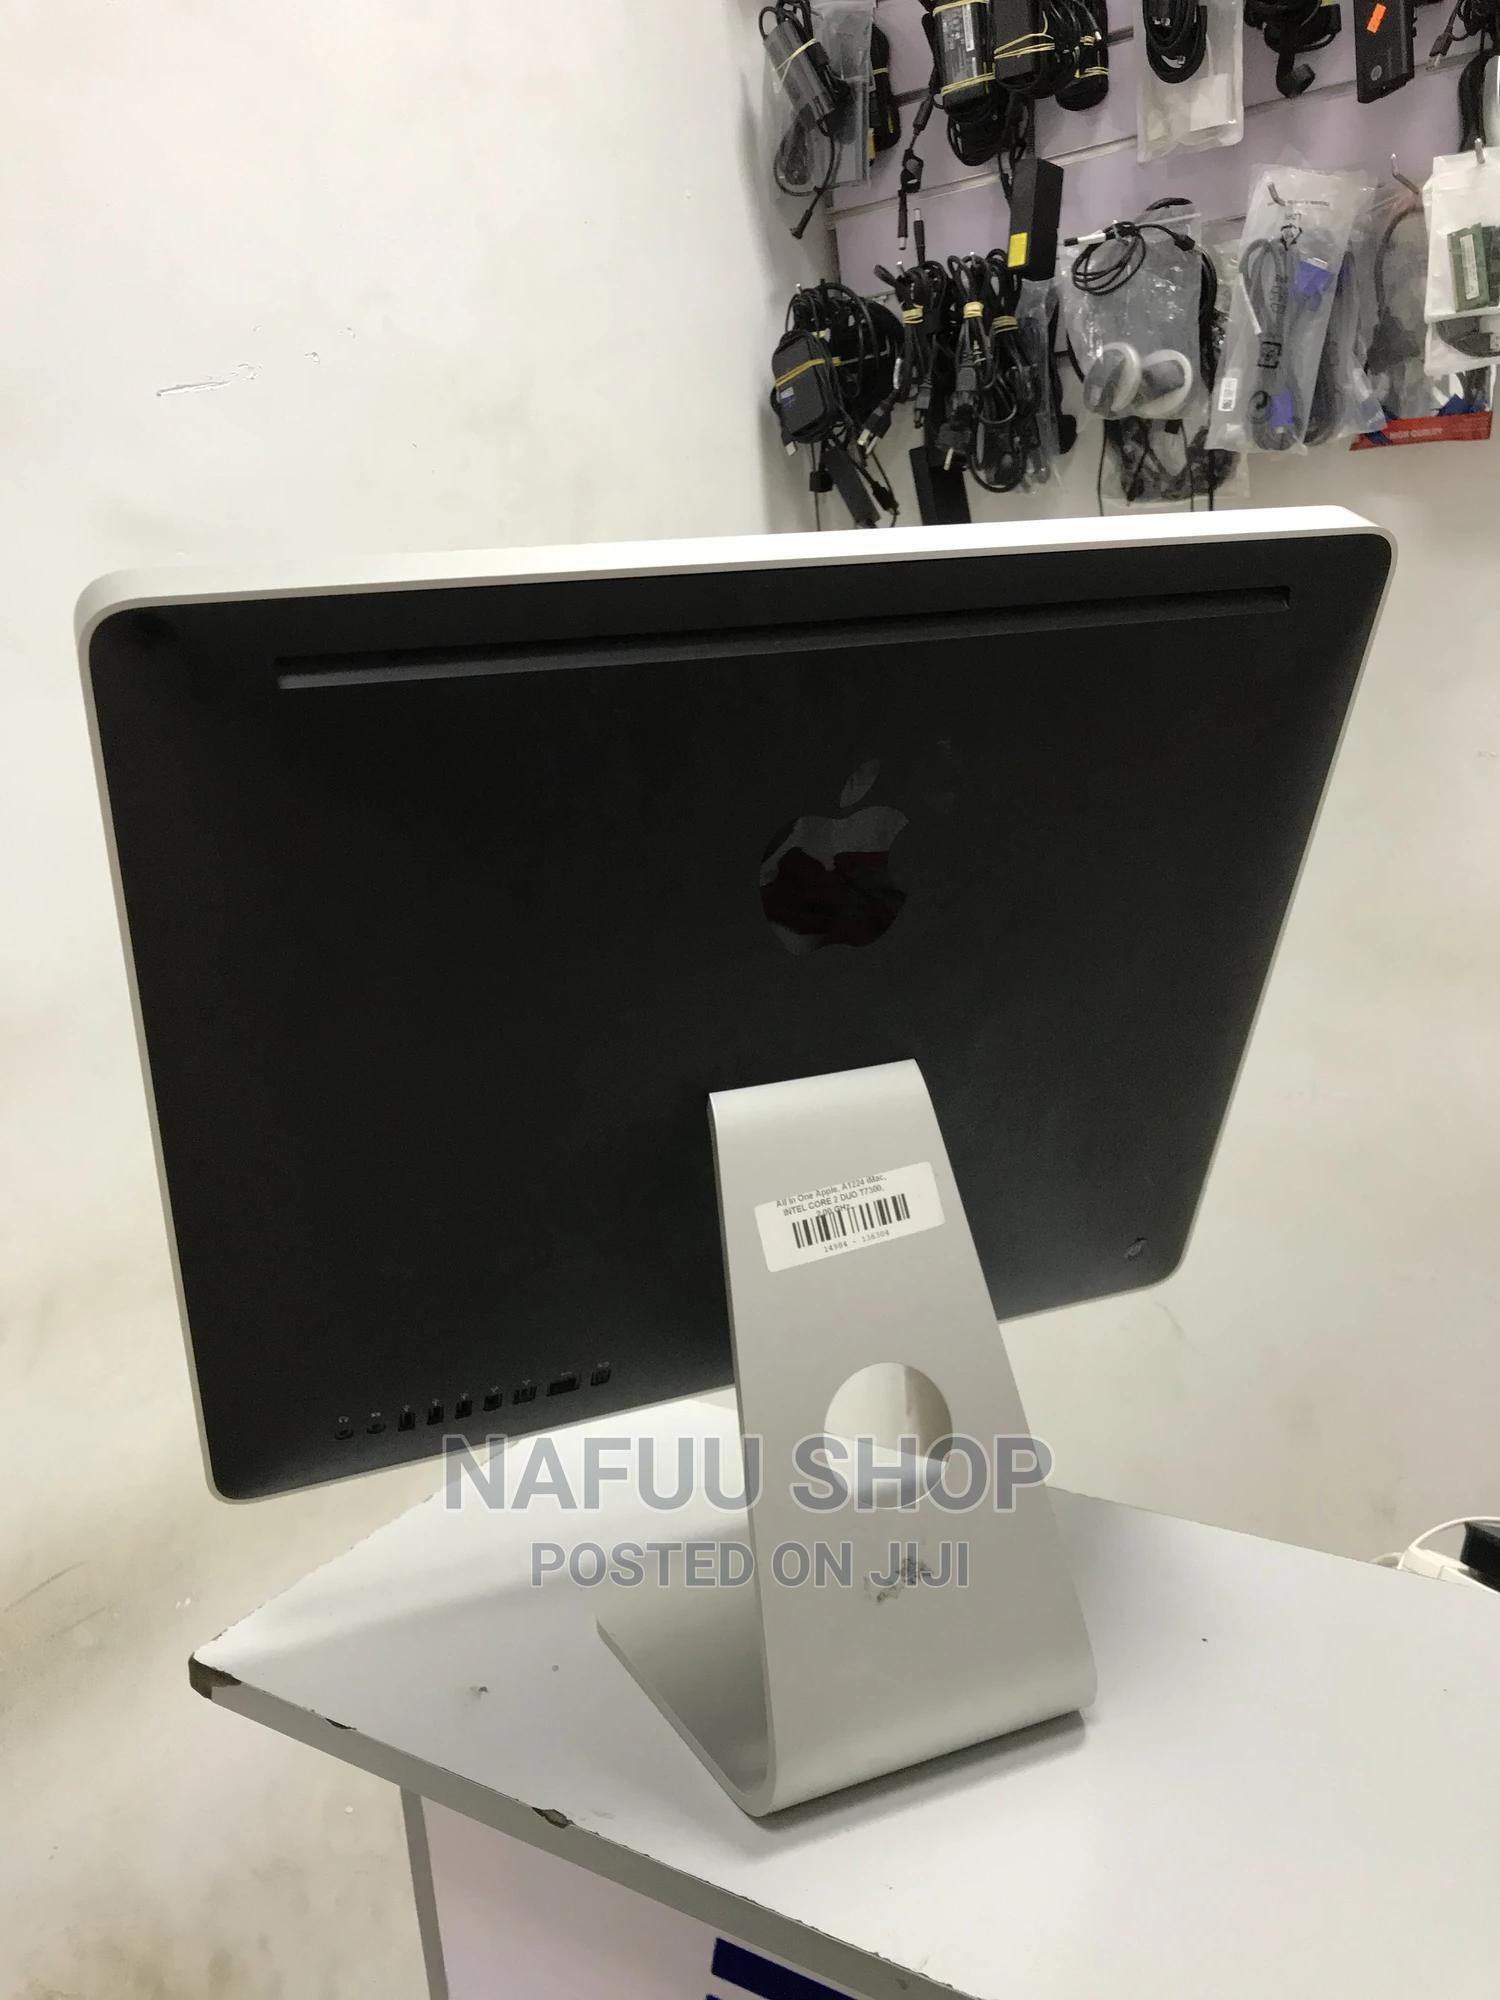 Desktop Computer Apple iMac 4GB Intel HDD 500GB | Laptops & Computers for sale in Ilala, Dar es Salaam, Tanzania